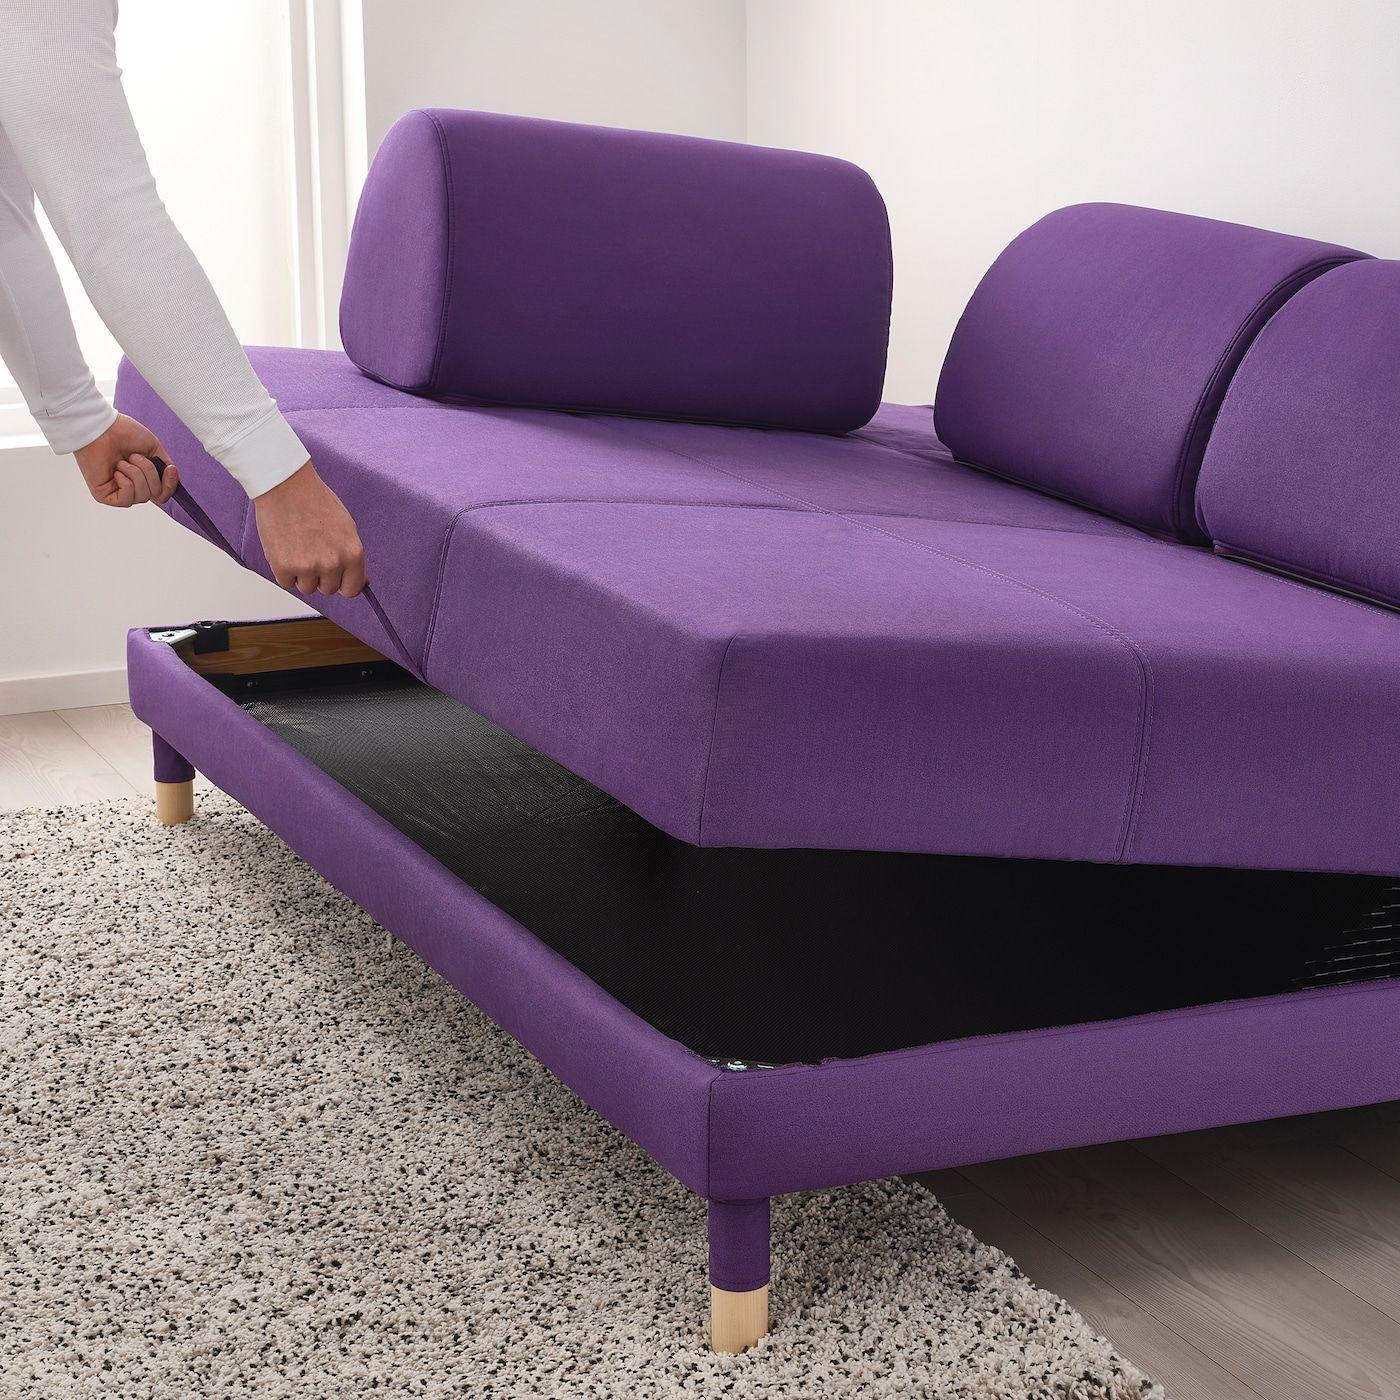 Flottebo Sleeper Sofa Vissle Purple 47 1 4 120 Cm Sleeper Sofa Sofa Sofa Frame